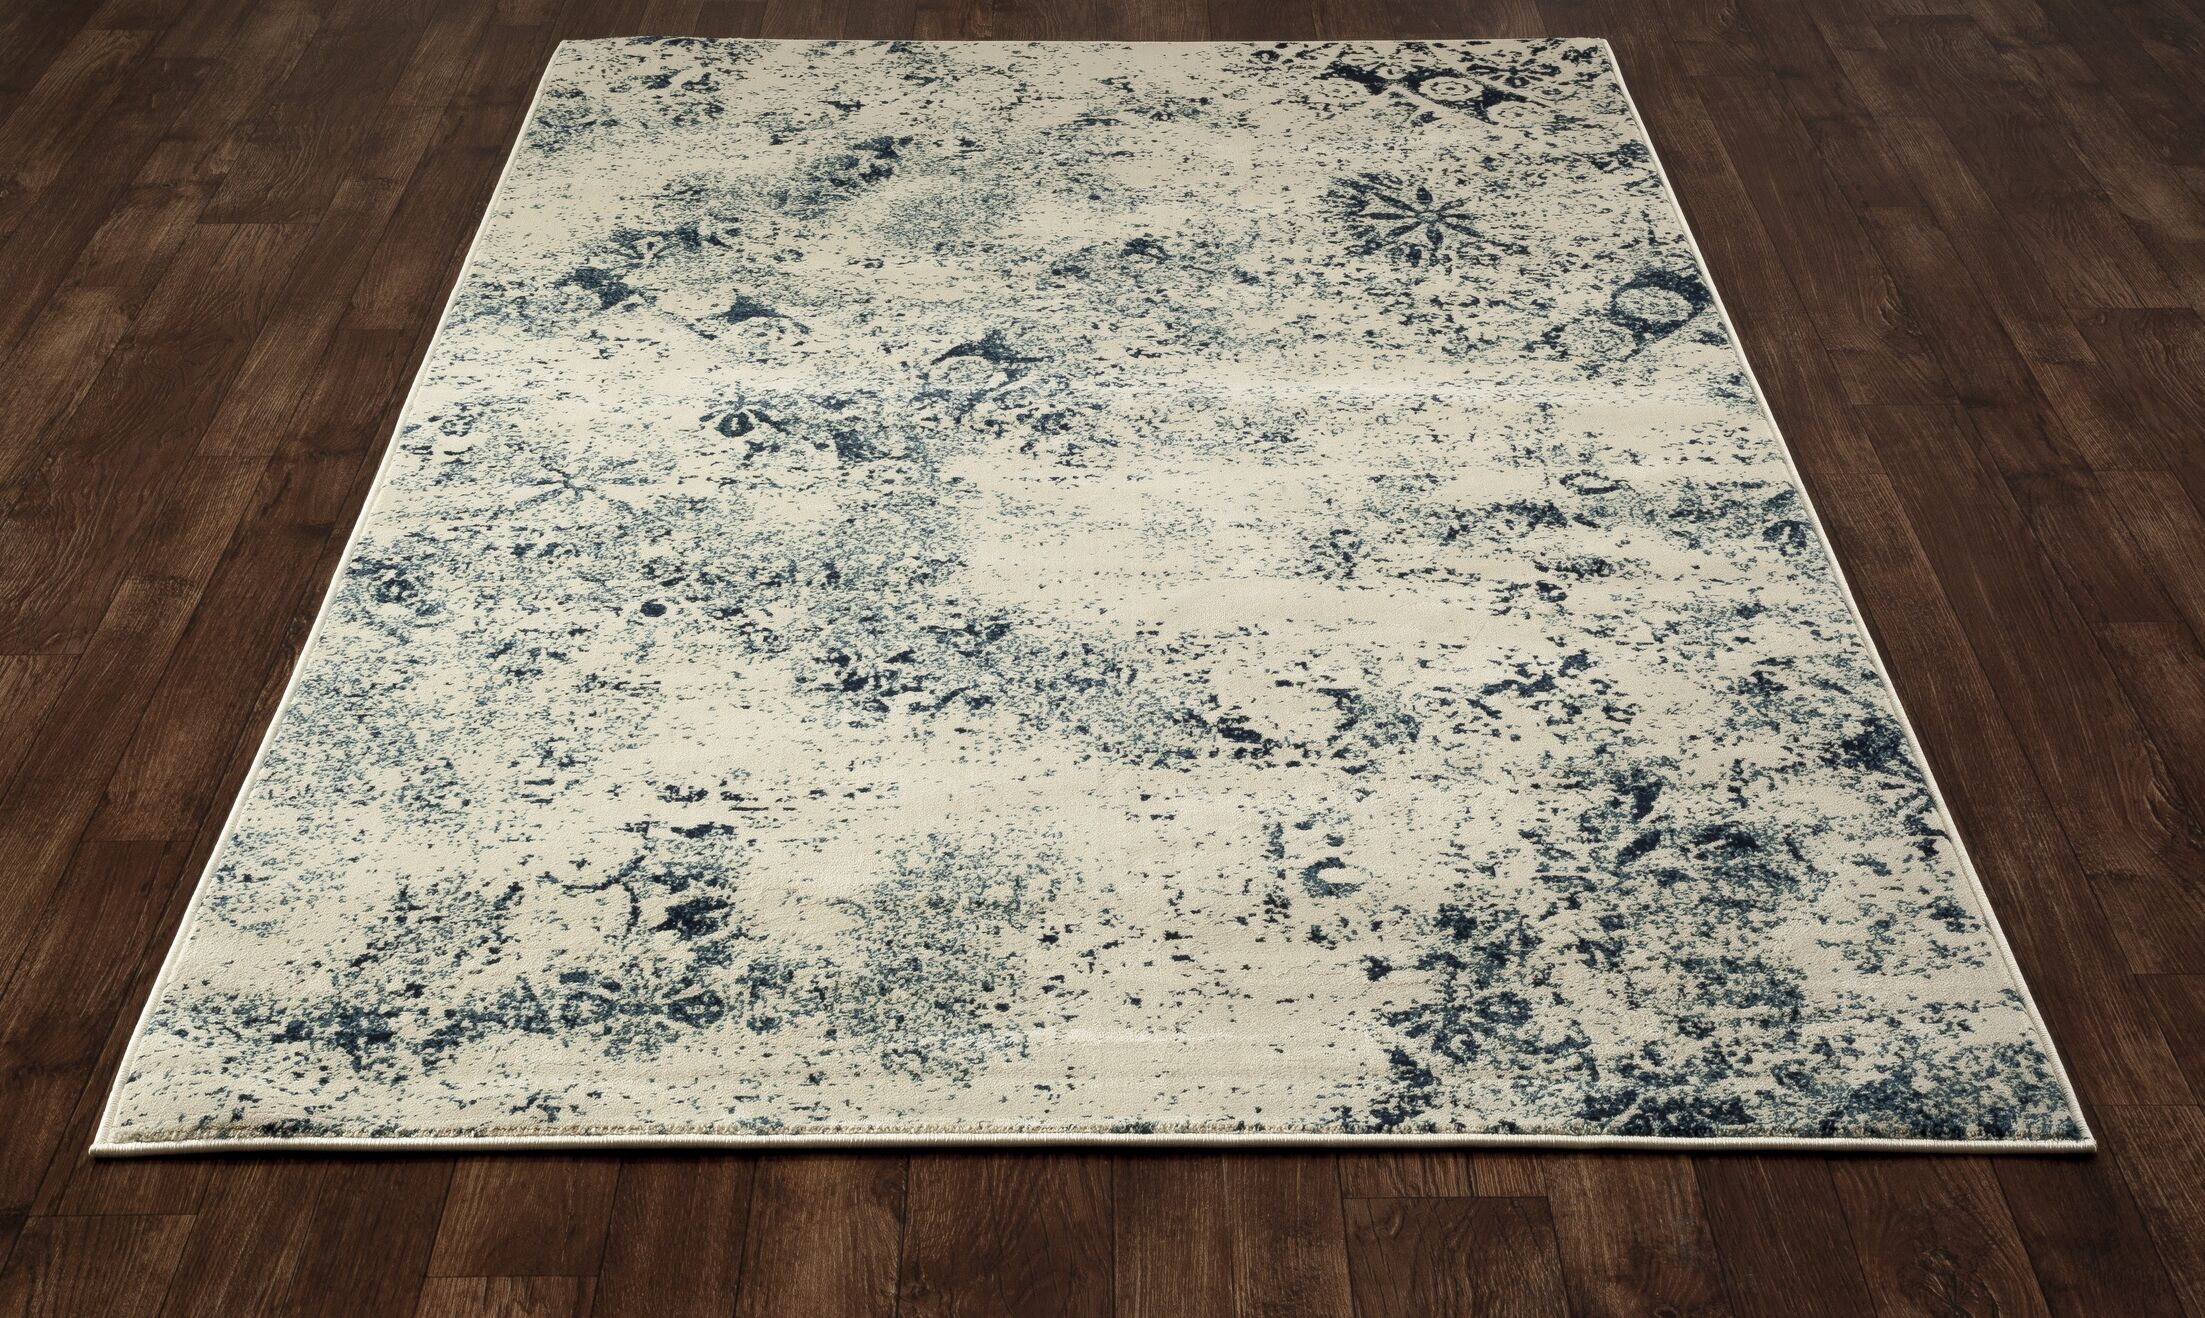 Devay Steel Blue Area Rug Rug Size: 9'2 x 12'6